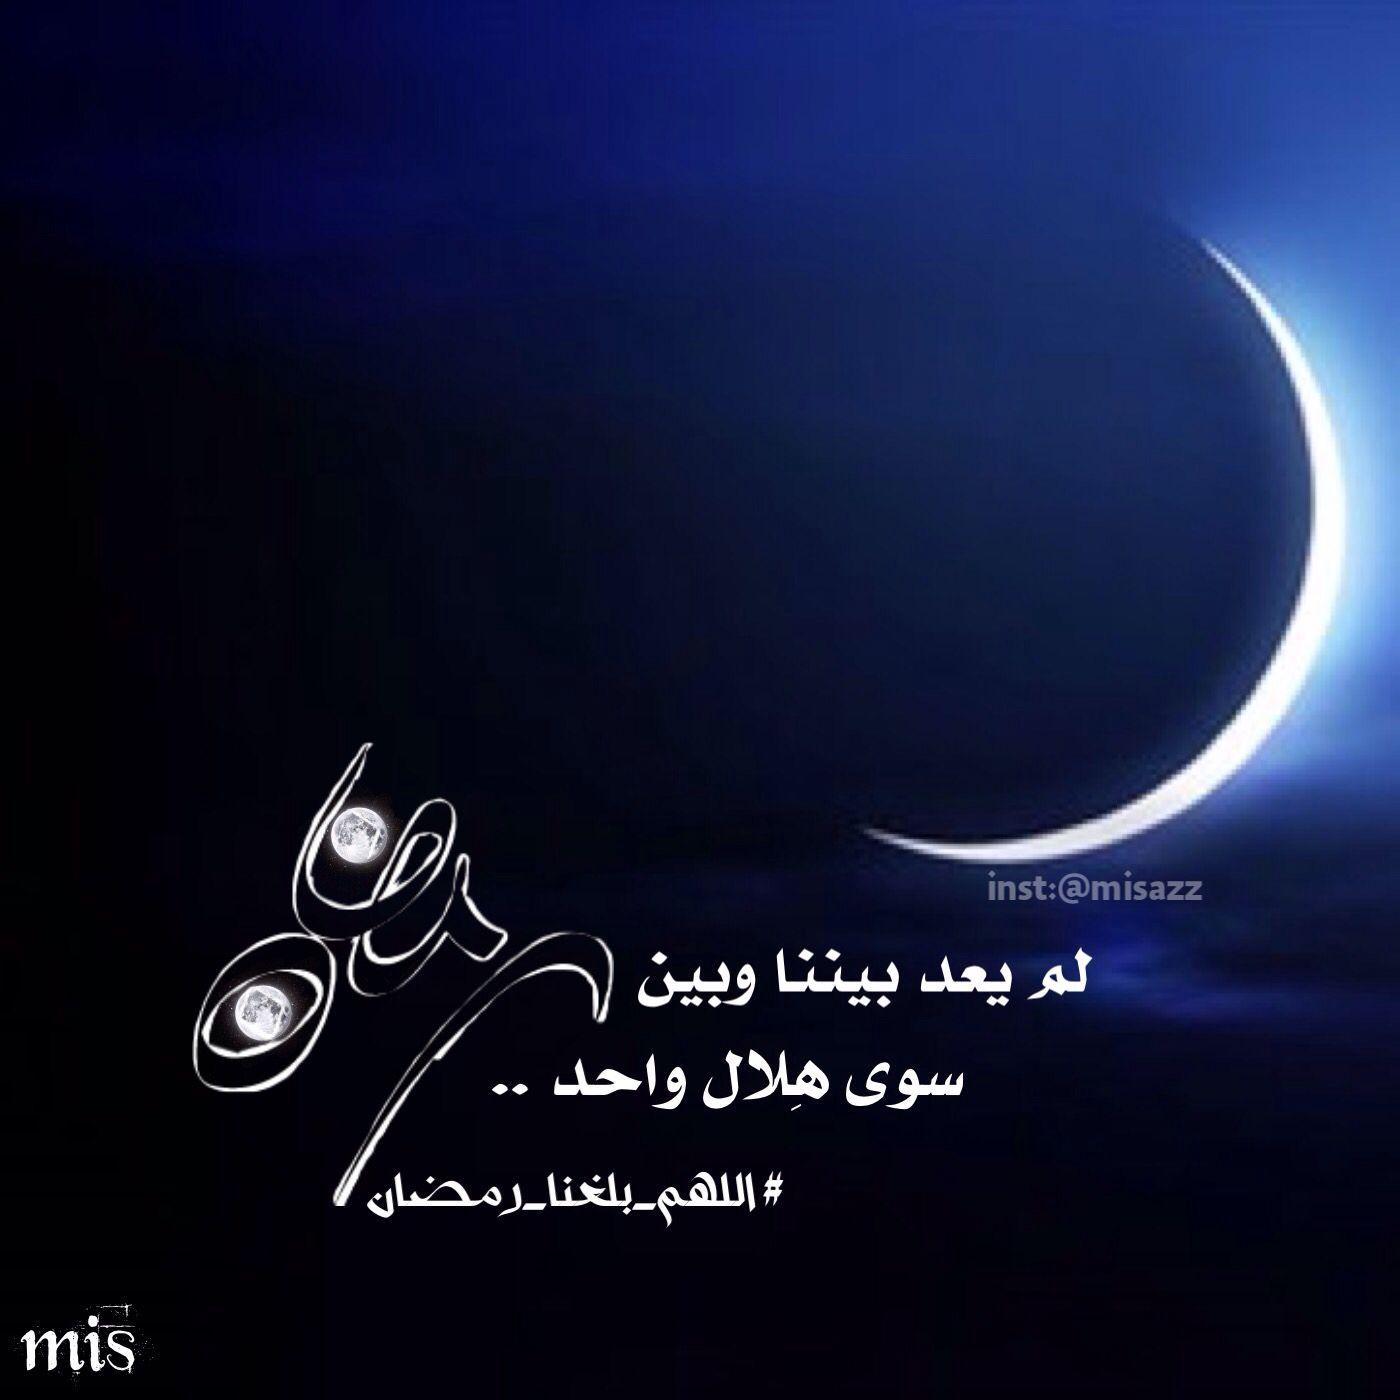 اللهم بلغنا رمضان امين يارب Movie Posters Poster Lockscreen